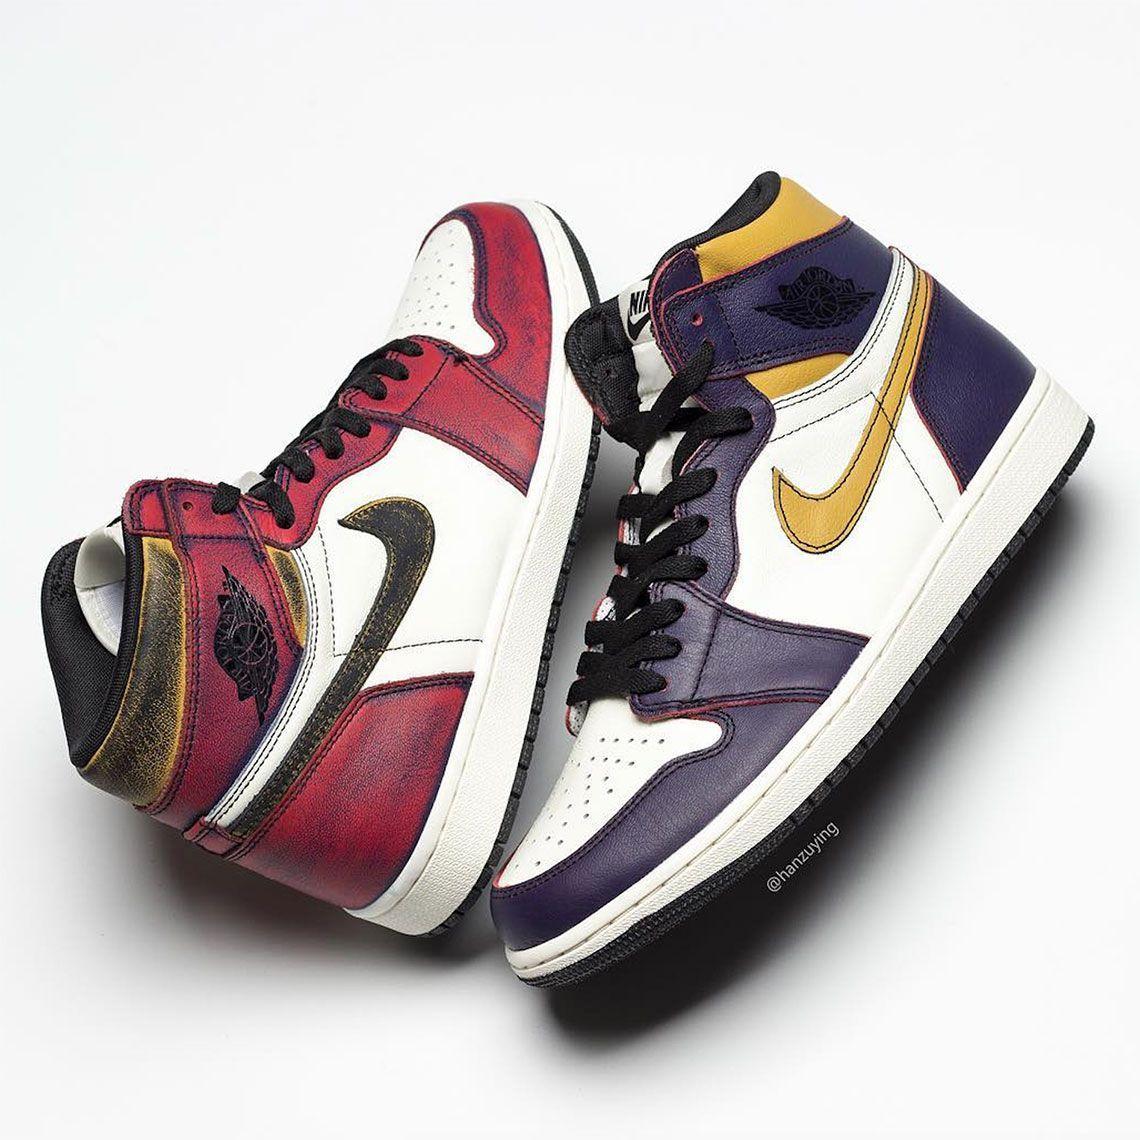 liderazgo Arqueológico Anticuado  Air Jordan 1 SB Shoes - Lakers Bulls | SneakerNews.com | Air jordans,  Jordans, Nike sb